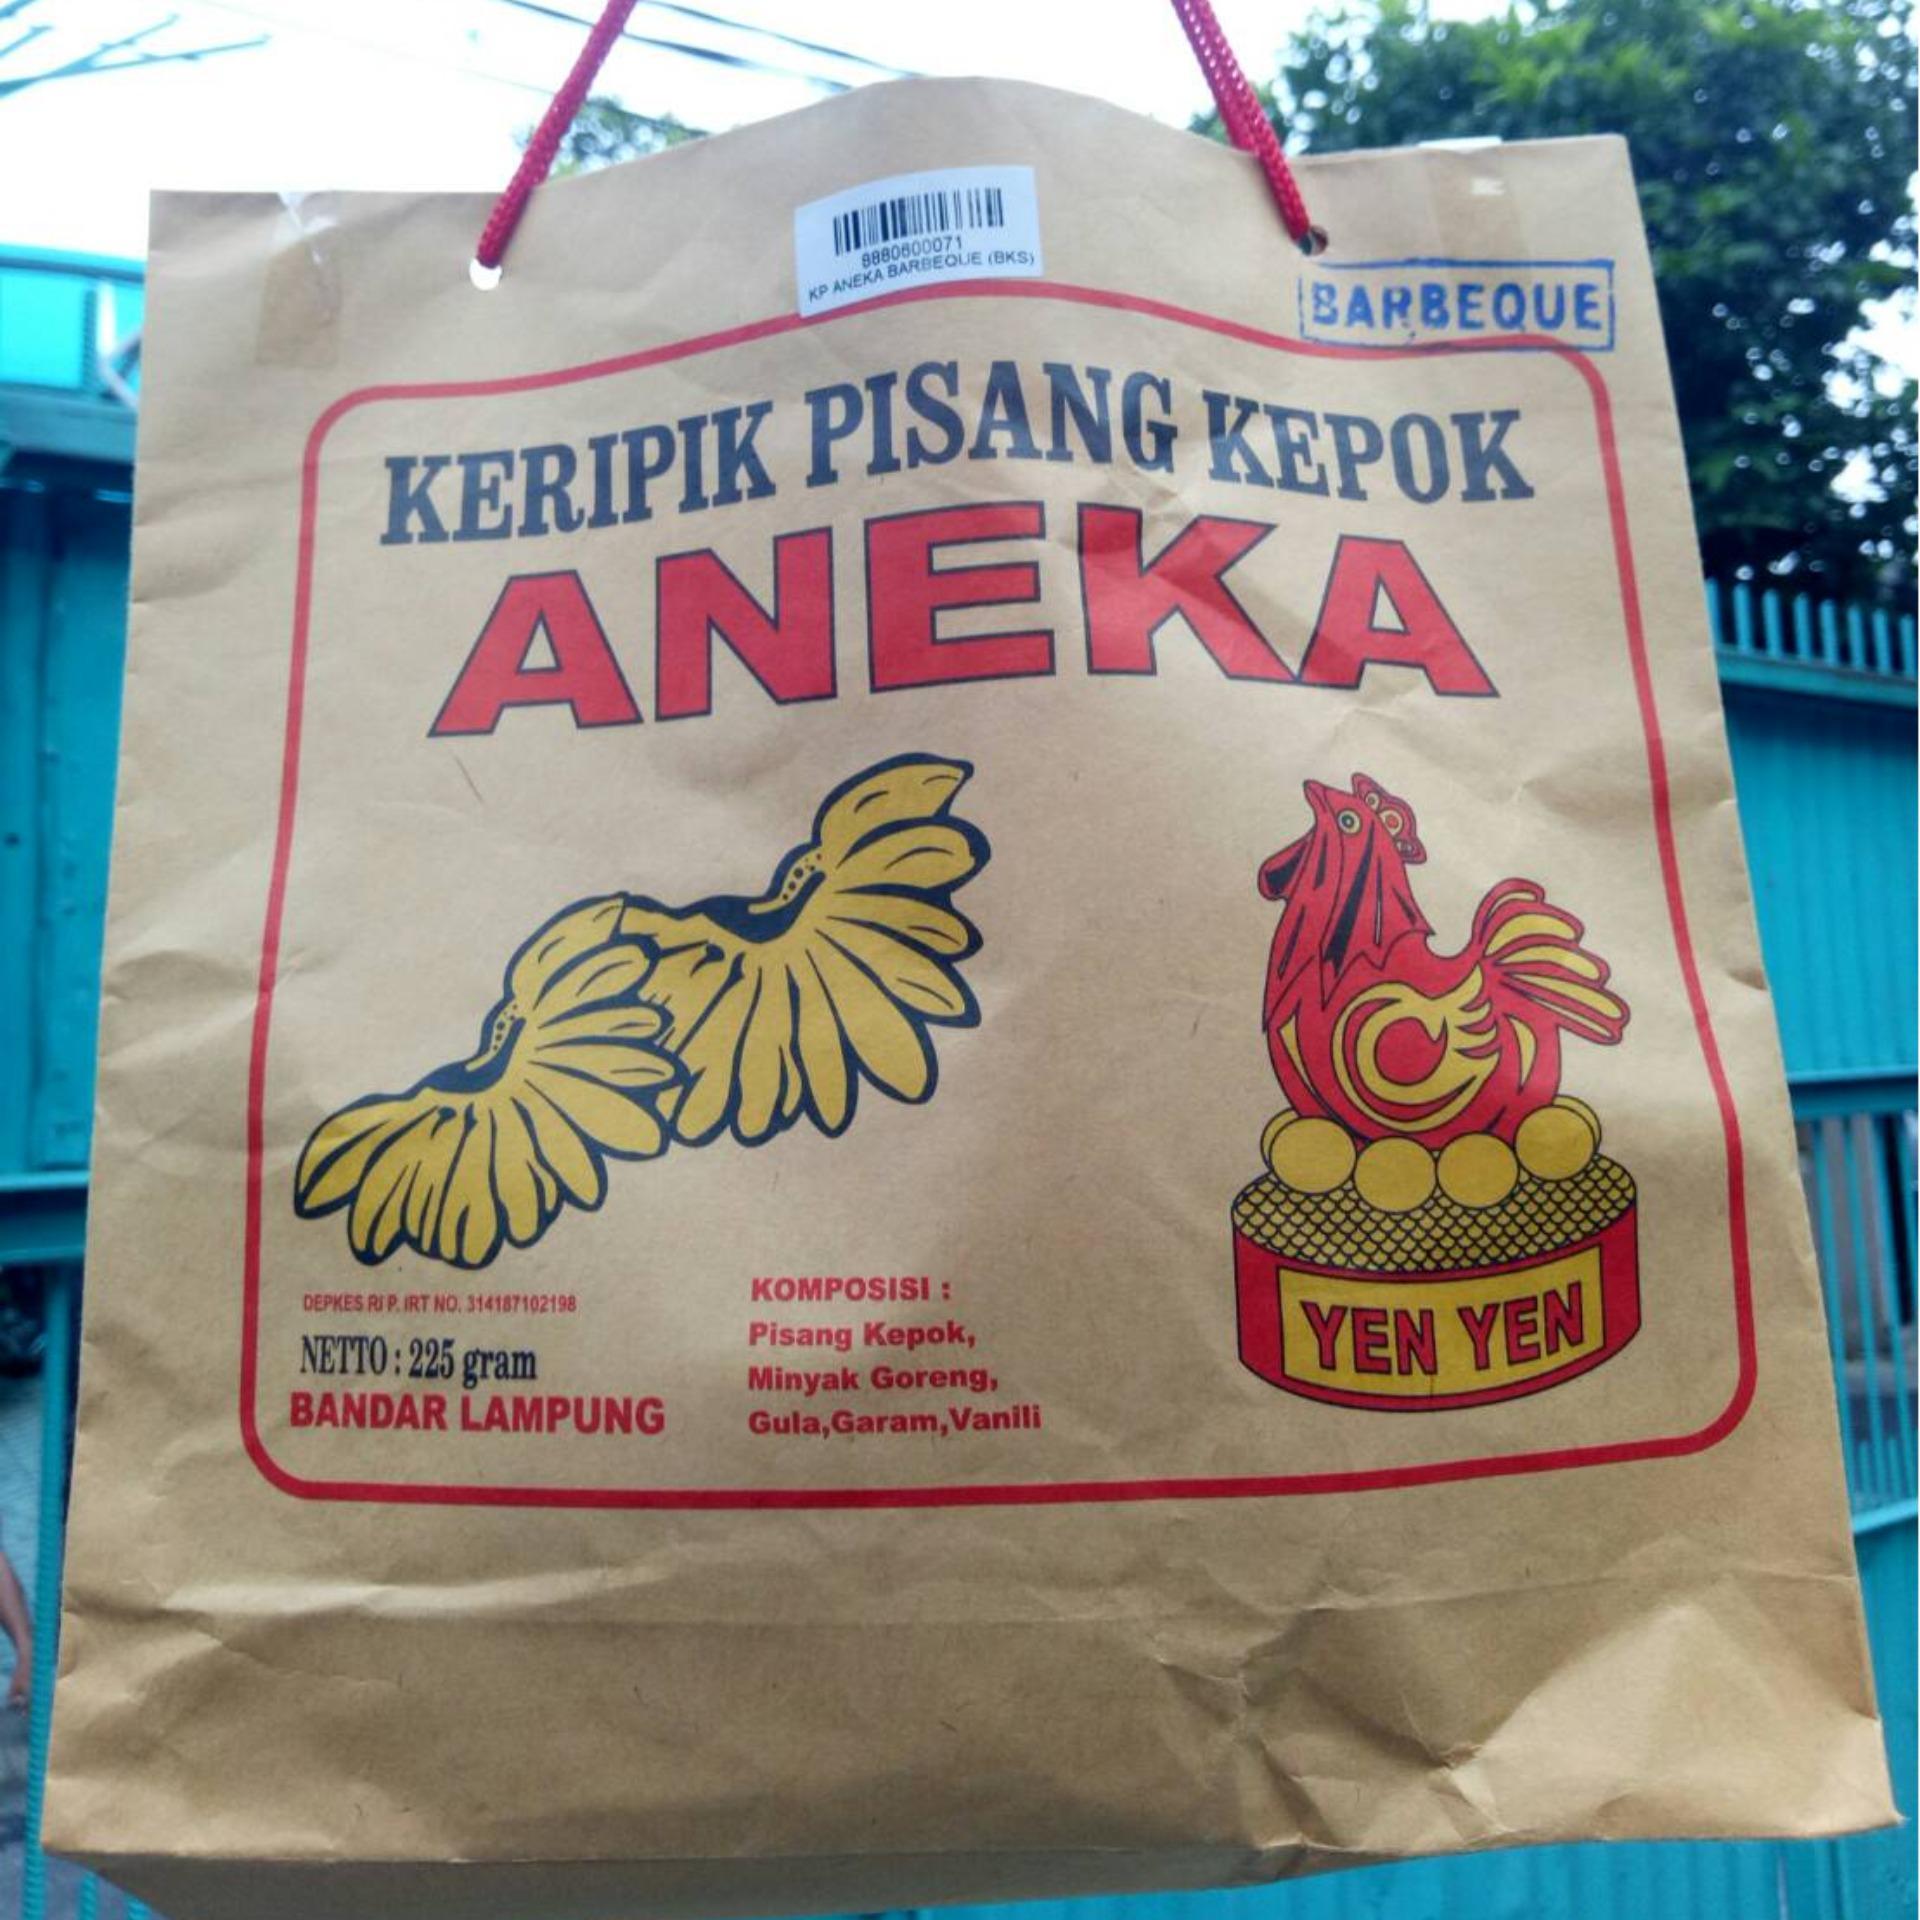 Keripik Pisang Lampung: Diskon Spesial KERIPIK PISANG BARBEQUE ANEKA YENYEN LAMPUNG